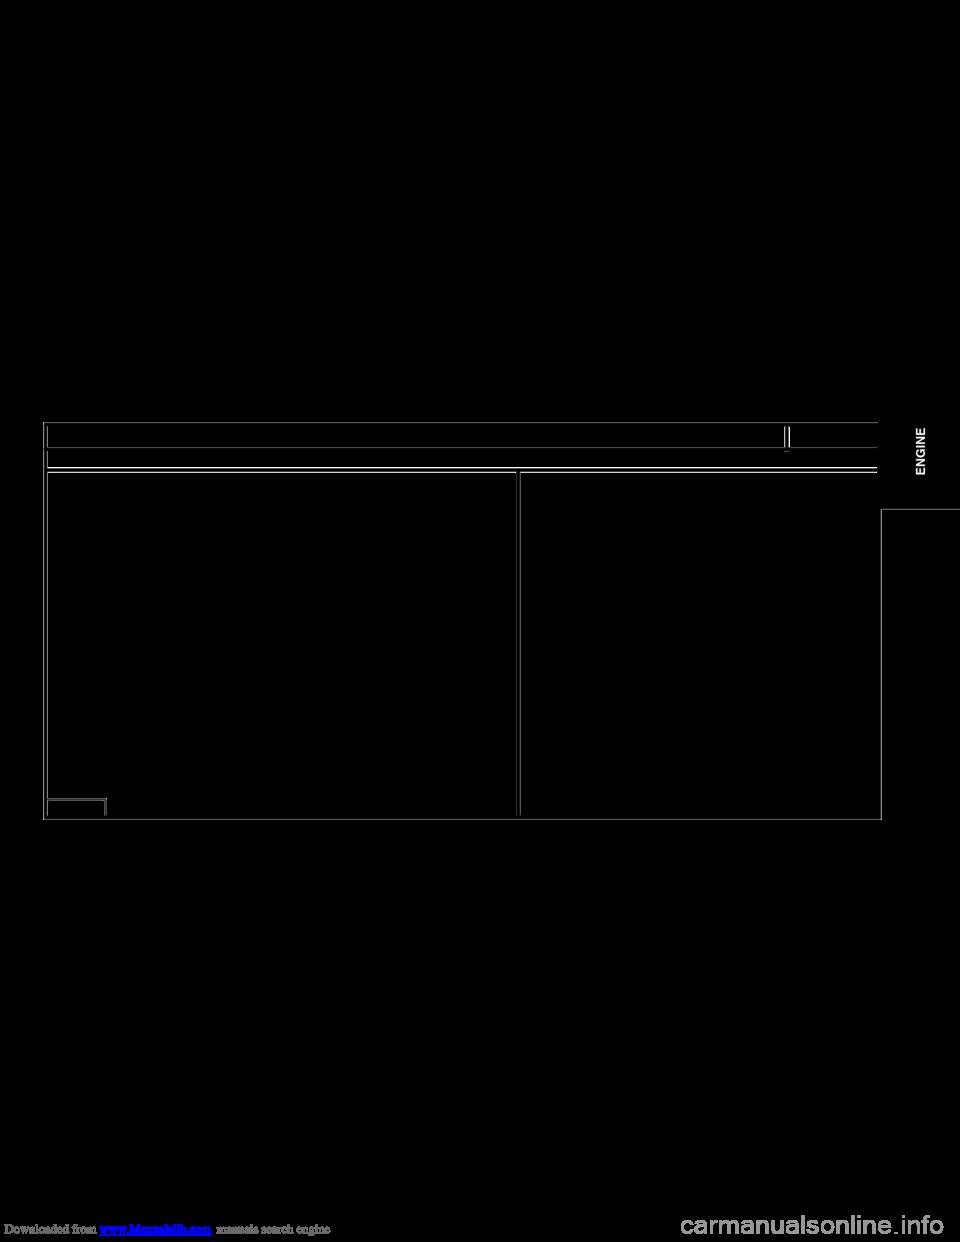 Citroen Xsara Picasso 2004 1g Workshop Manual Engine Diagram